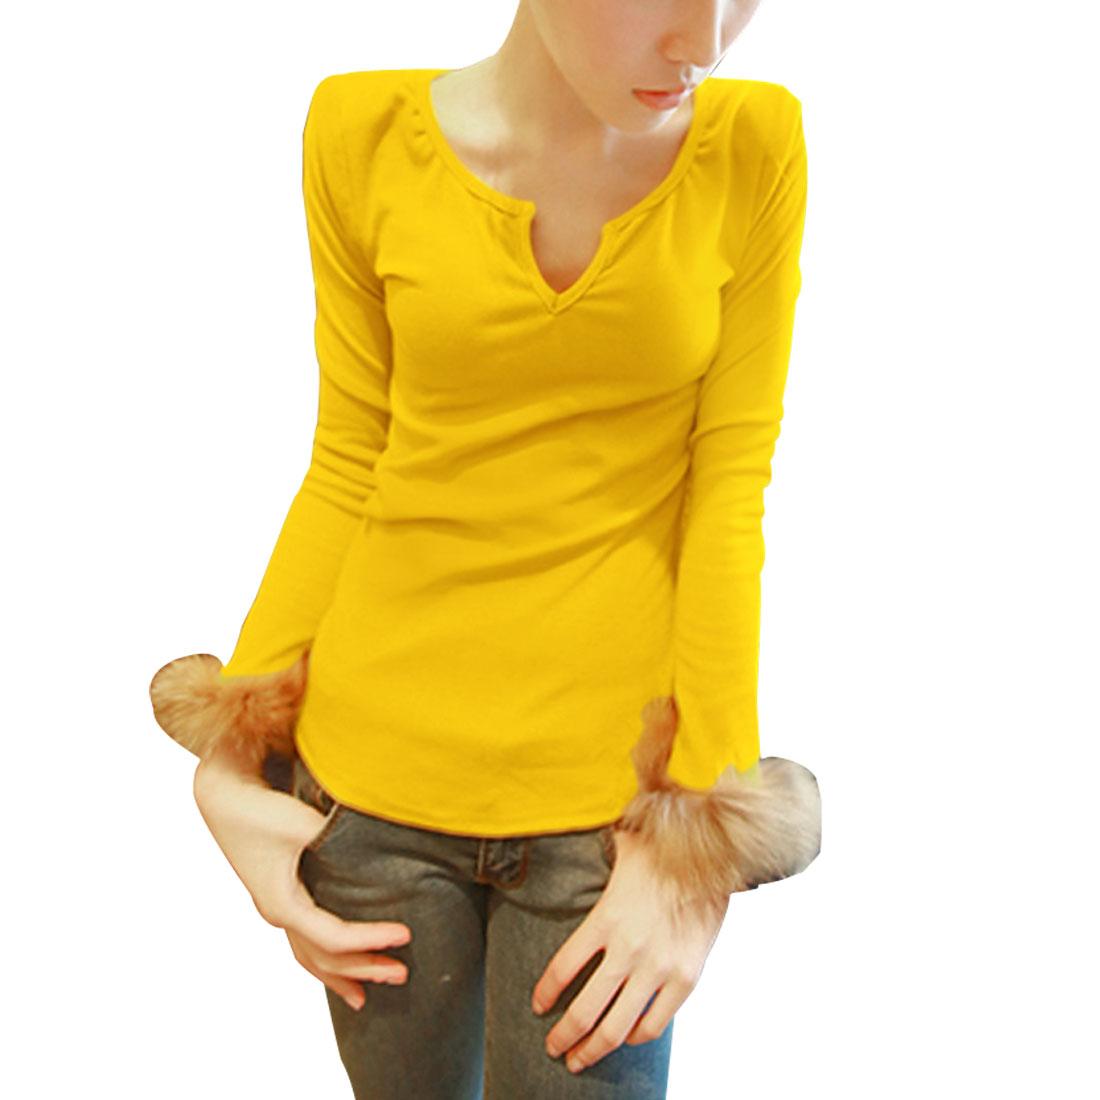 Women Yellow Padded Shoulder Long Sleeve Formfitting Spring Top Shirt XS